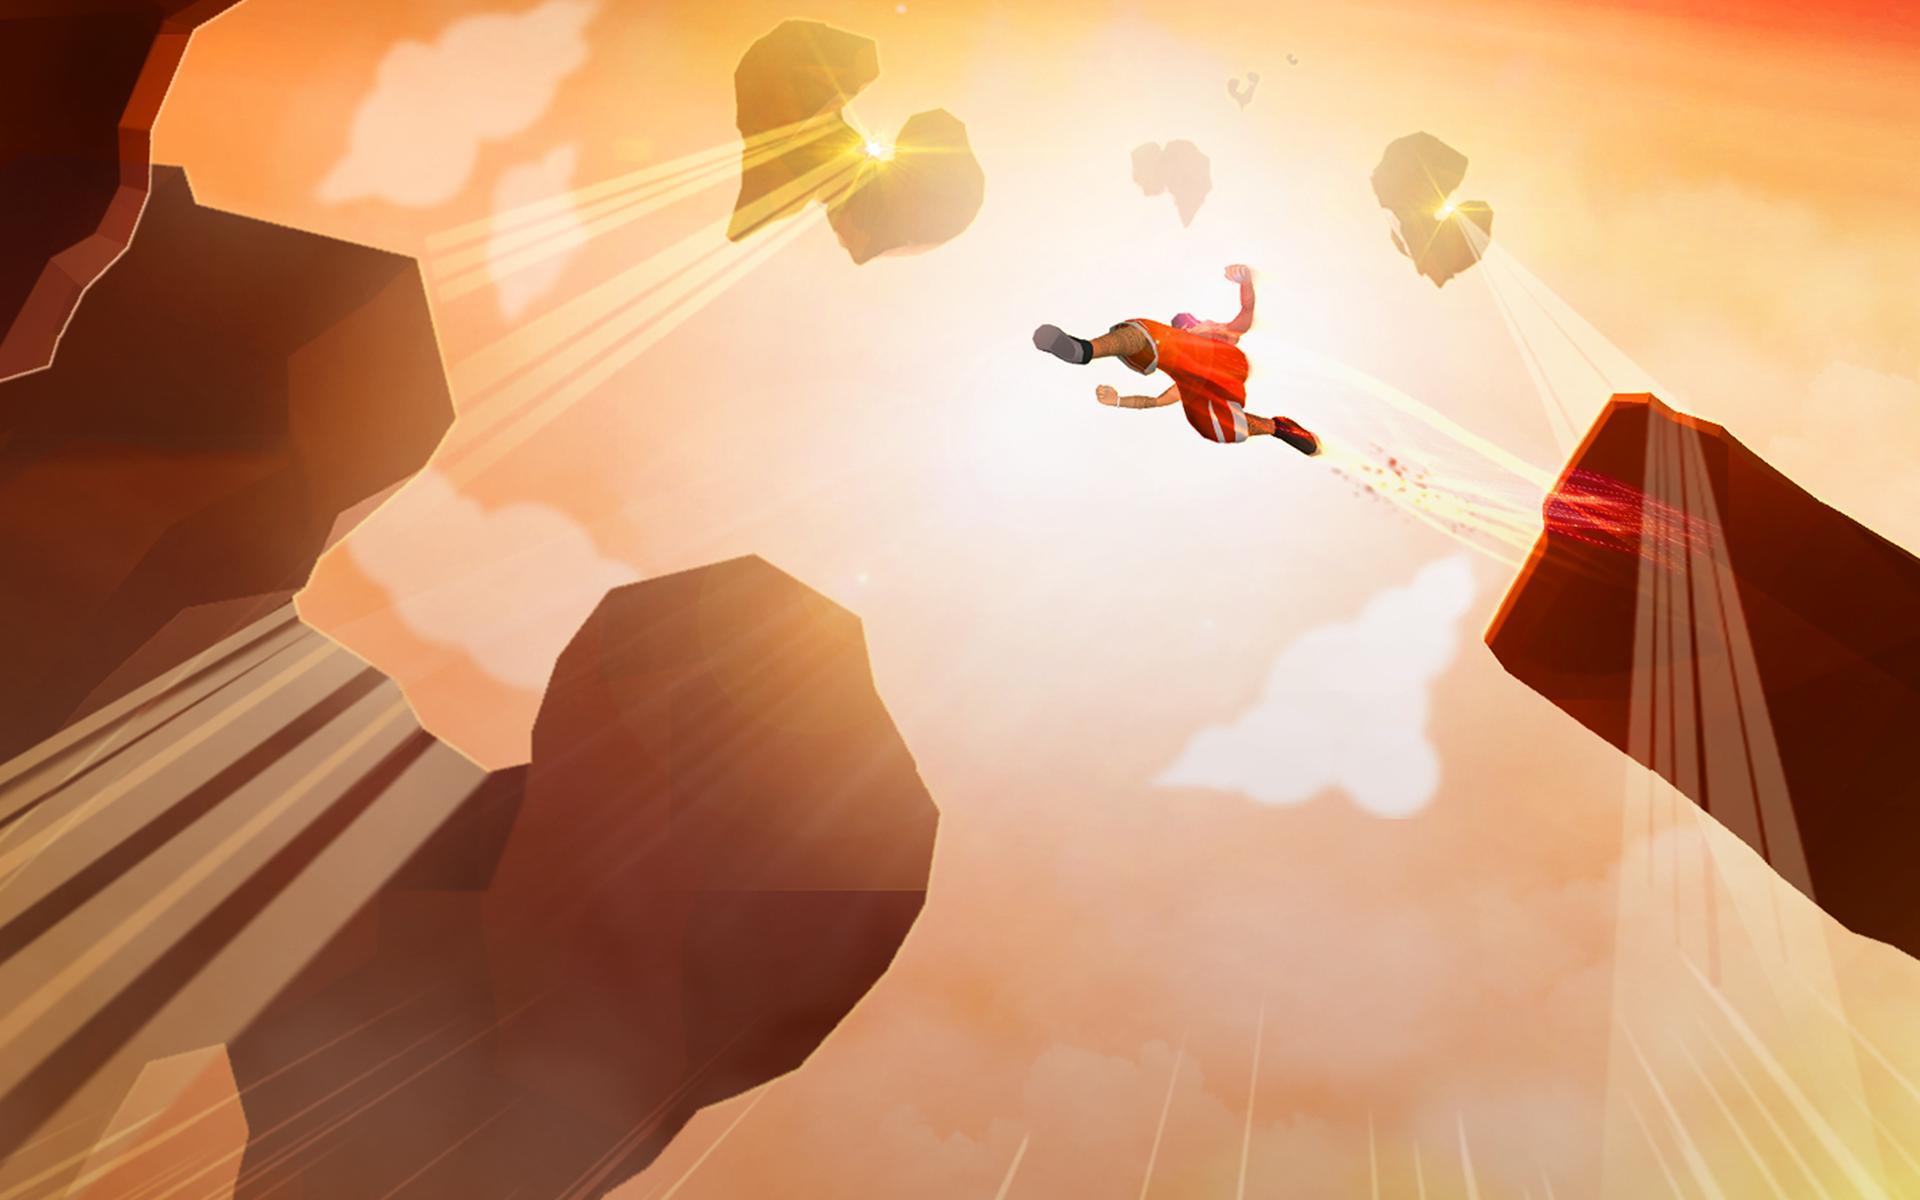 Sky Dancer Run - Running Game 4.2.0 Screenshot 17